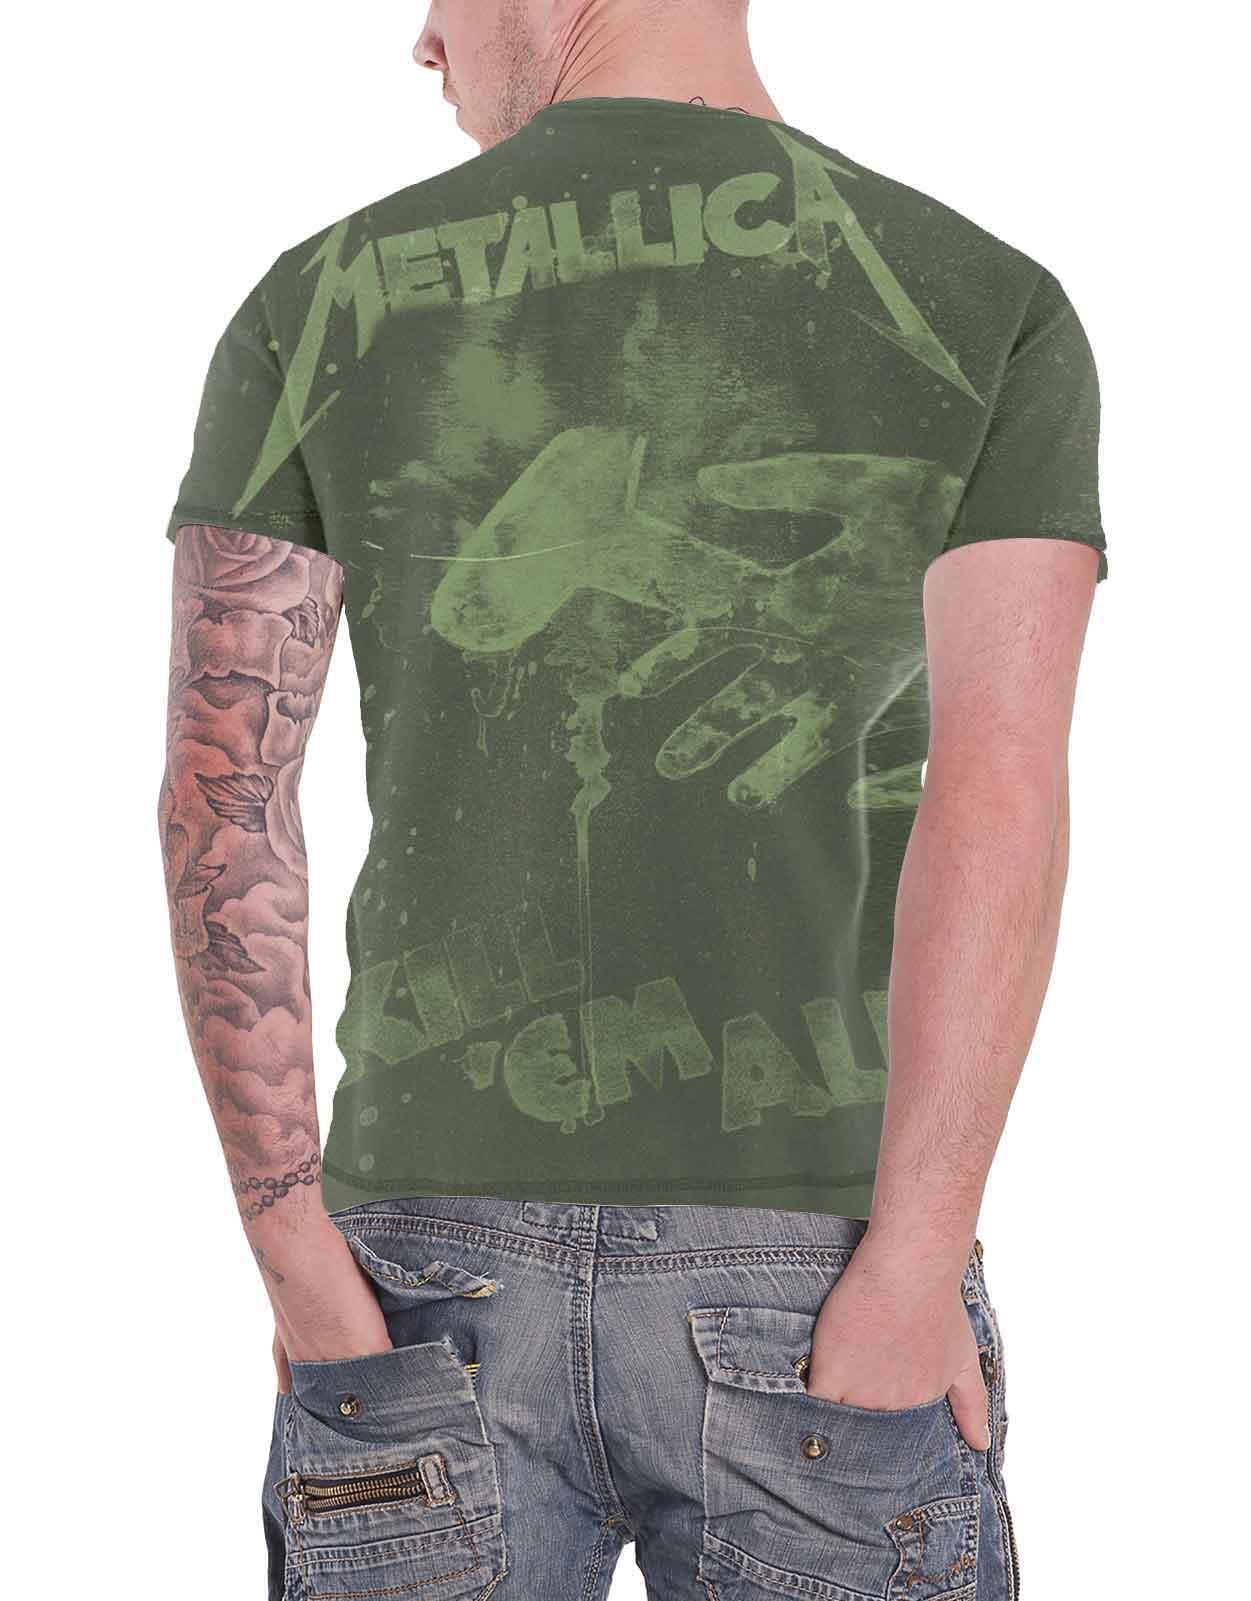 Officiel-Metallica-T-shirt-filaire-justice-for-all-RTL-Band-Logo-Homme-Nouveau miniature 31